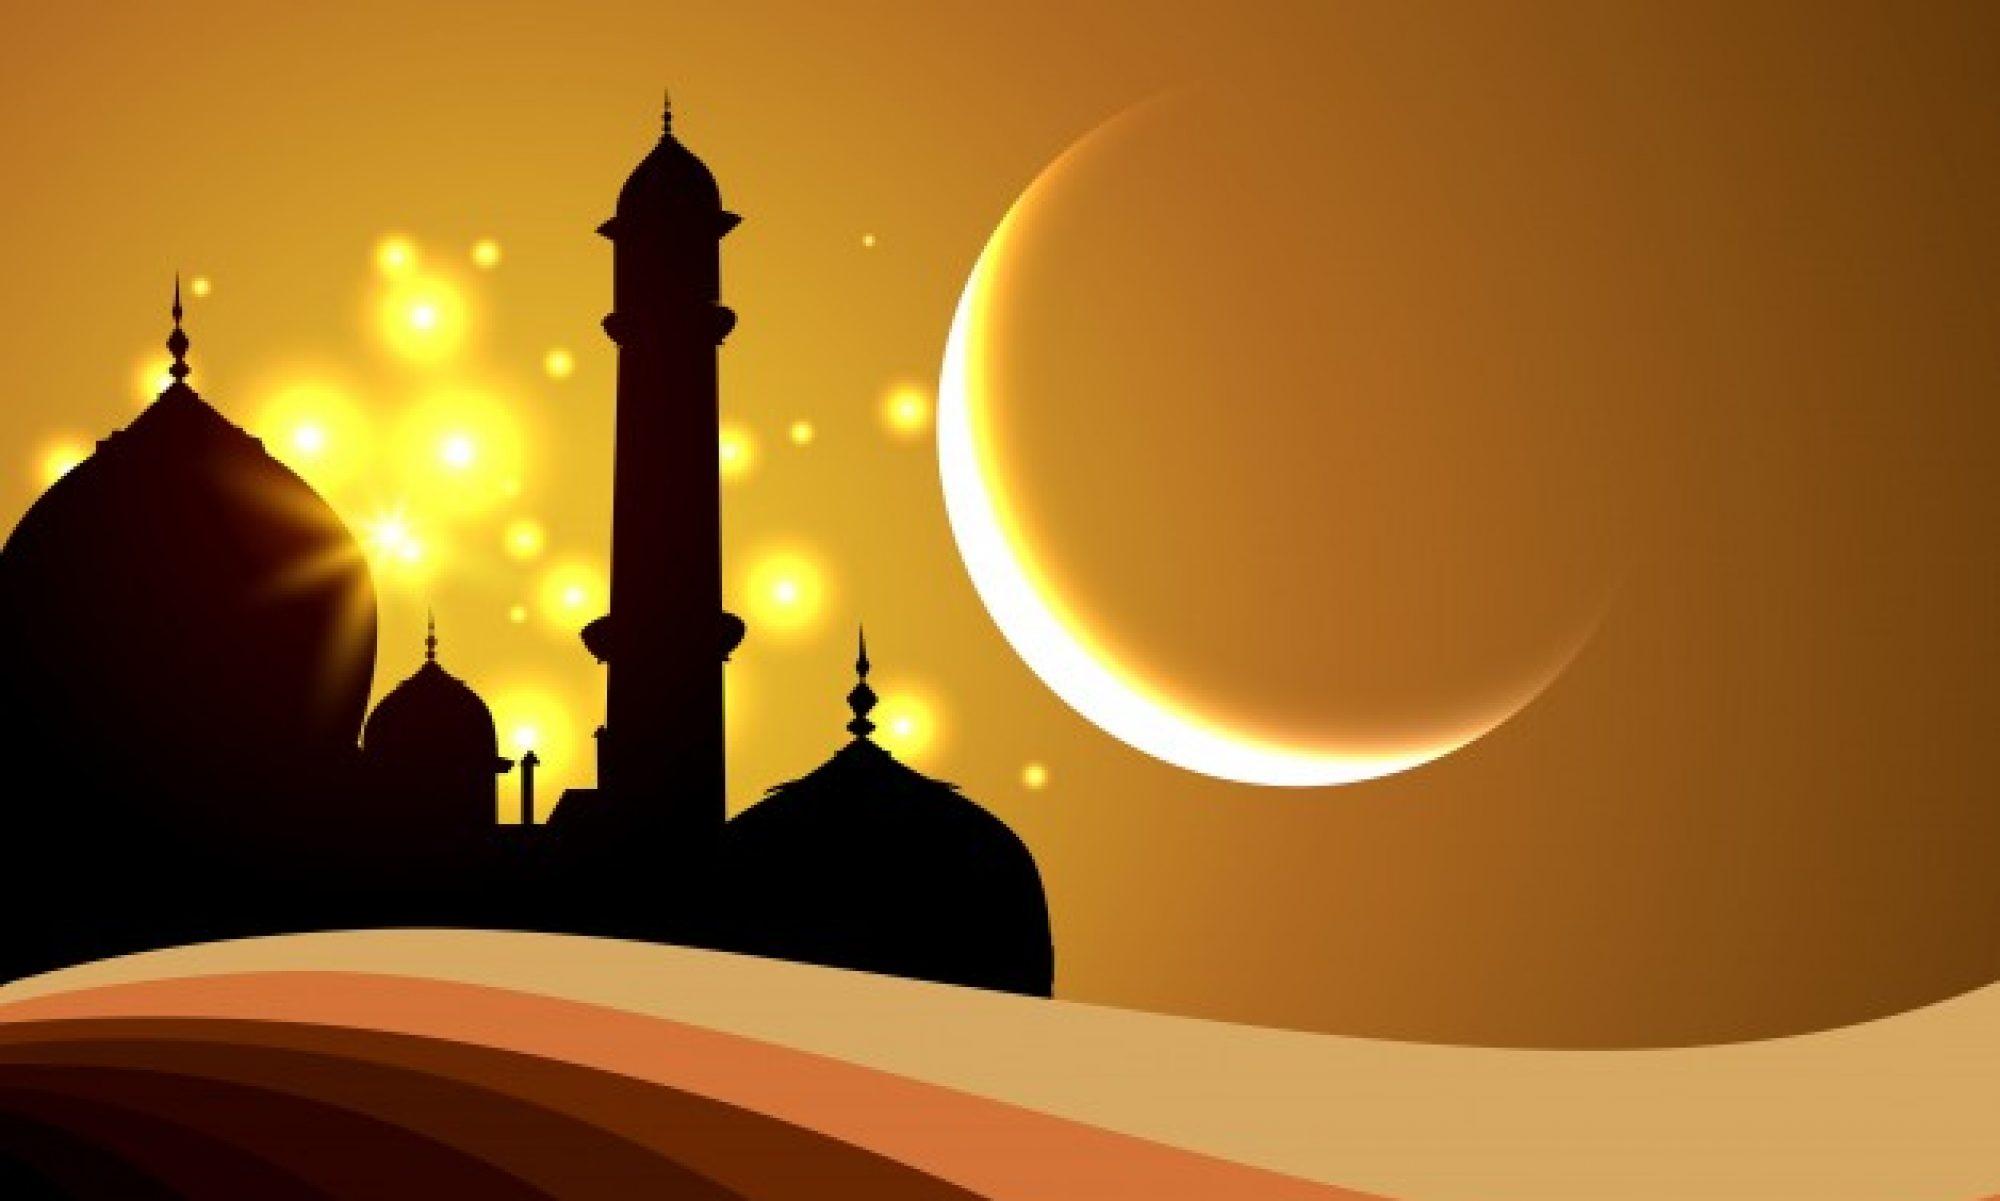 Mitramasjid.com Assalamu'alaikum, Jual Karpet Masjid, Sajadah, Jam jadwal digital Masjid Hub 08176848401 / 08118774455